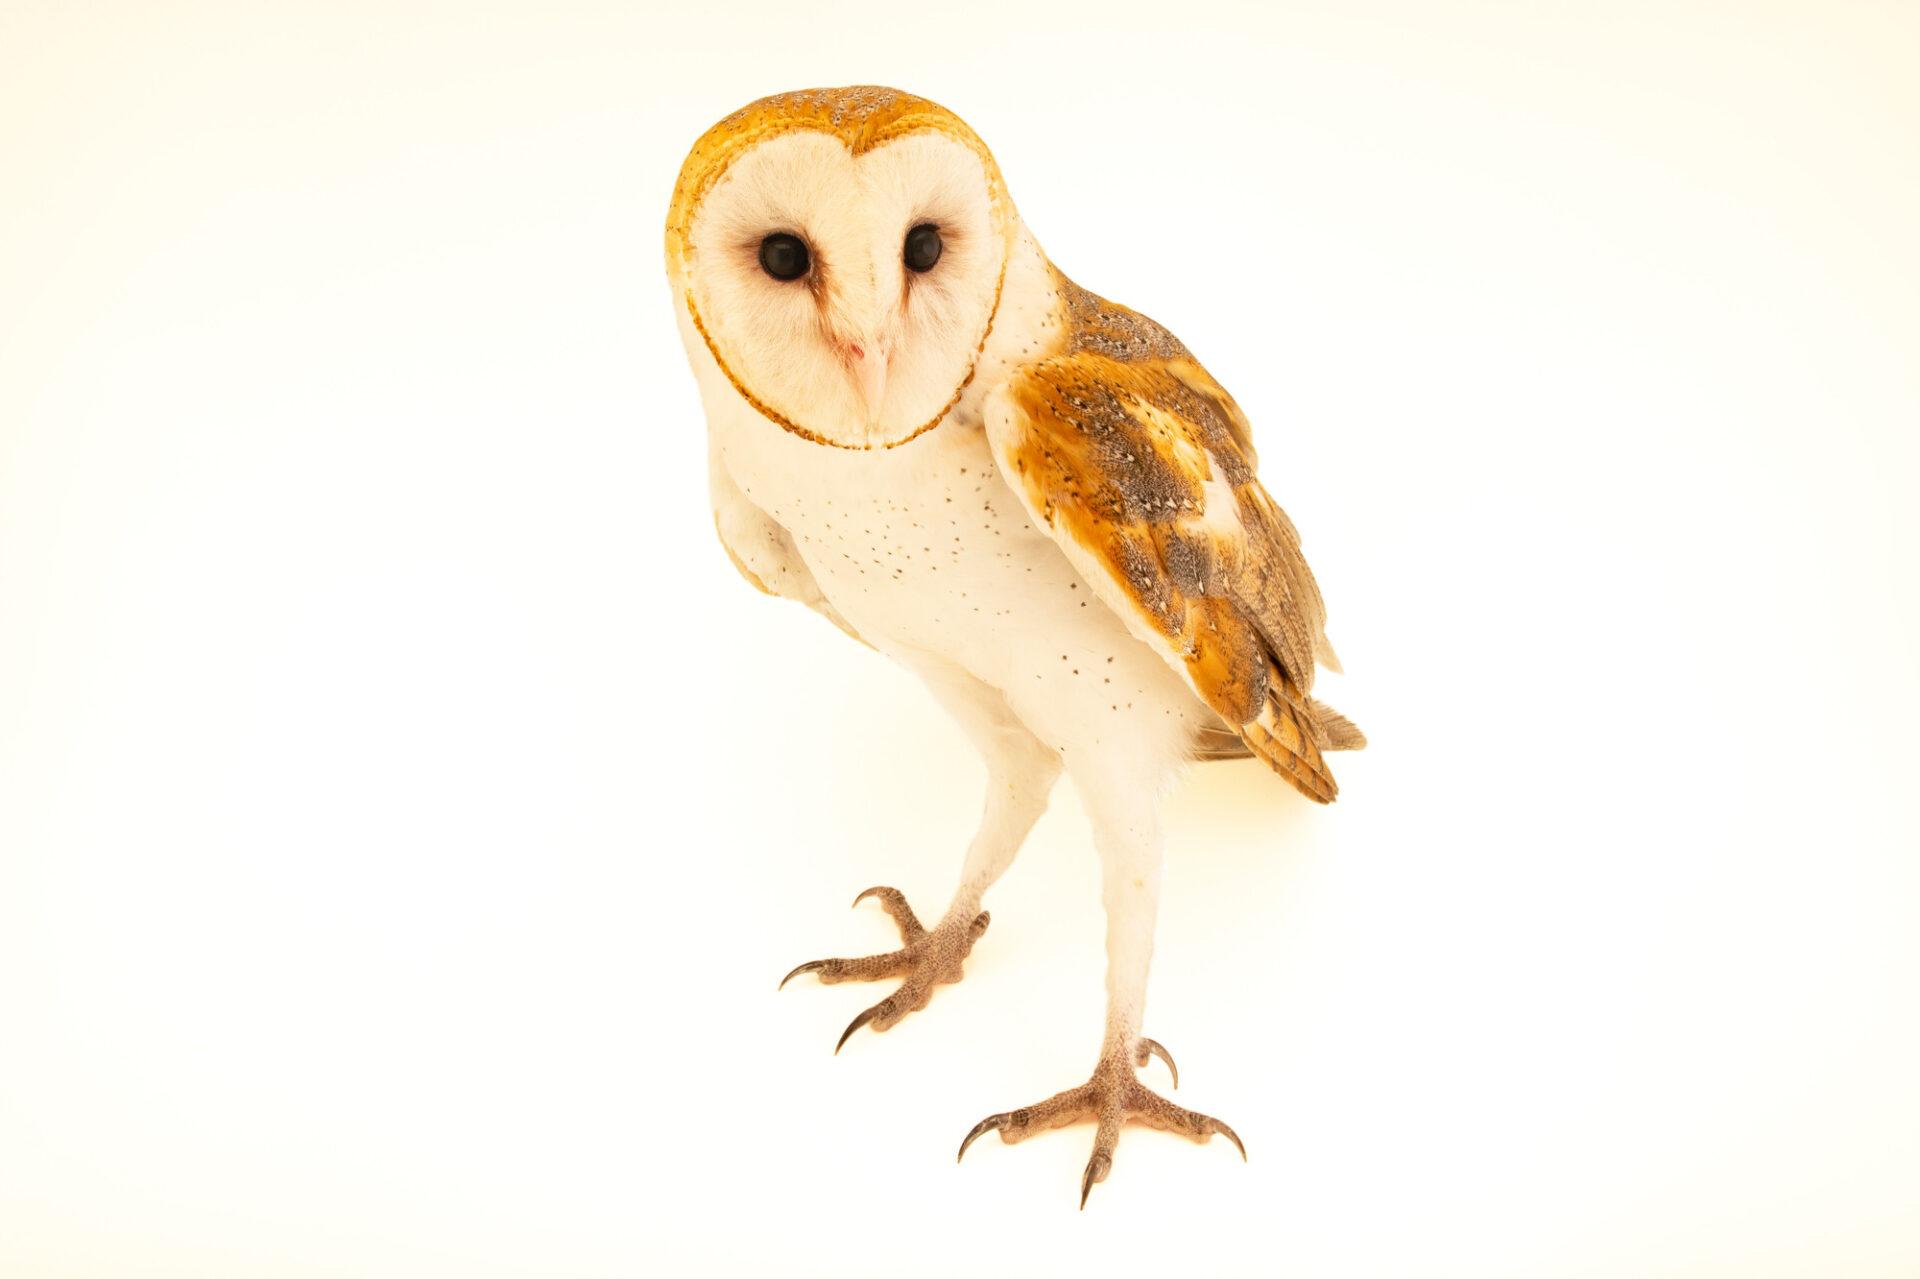 Photo: An American barn owl (Tyto alba pratincola) at Houston SPCA's Wildlife Center of Texas.